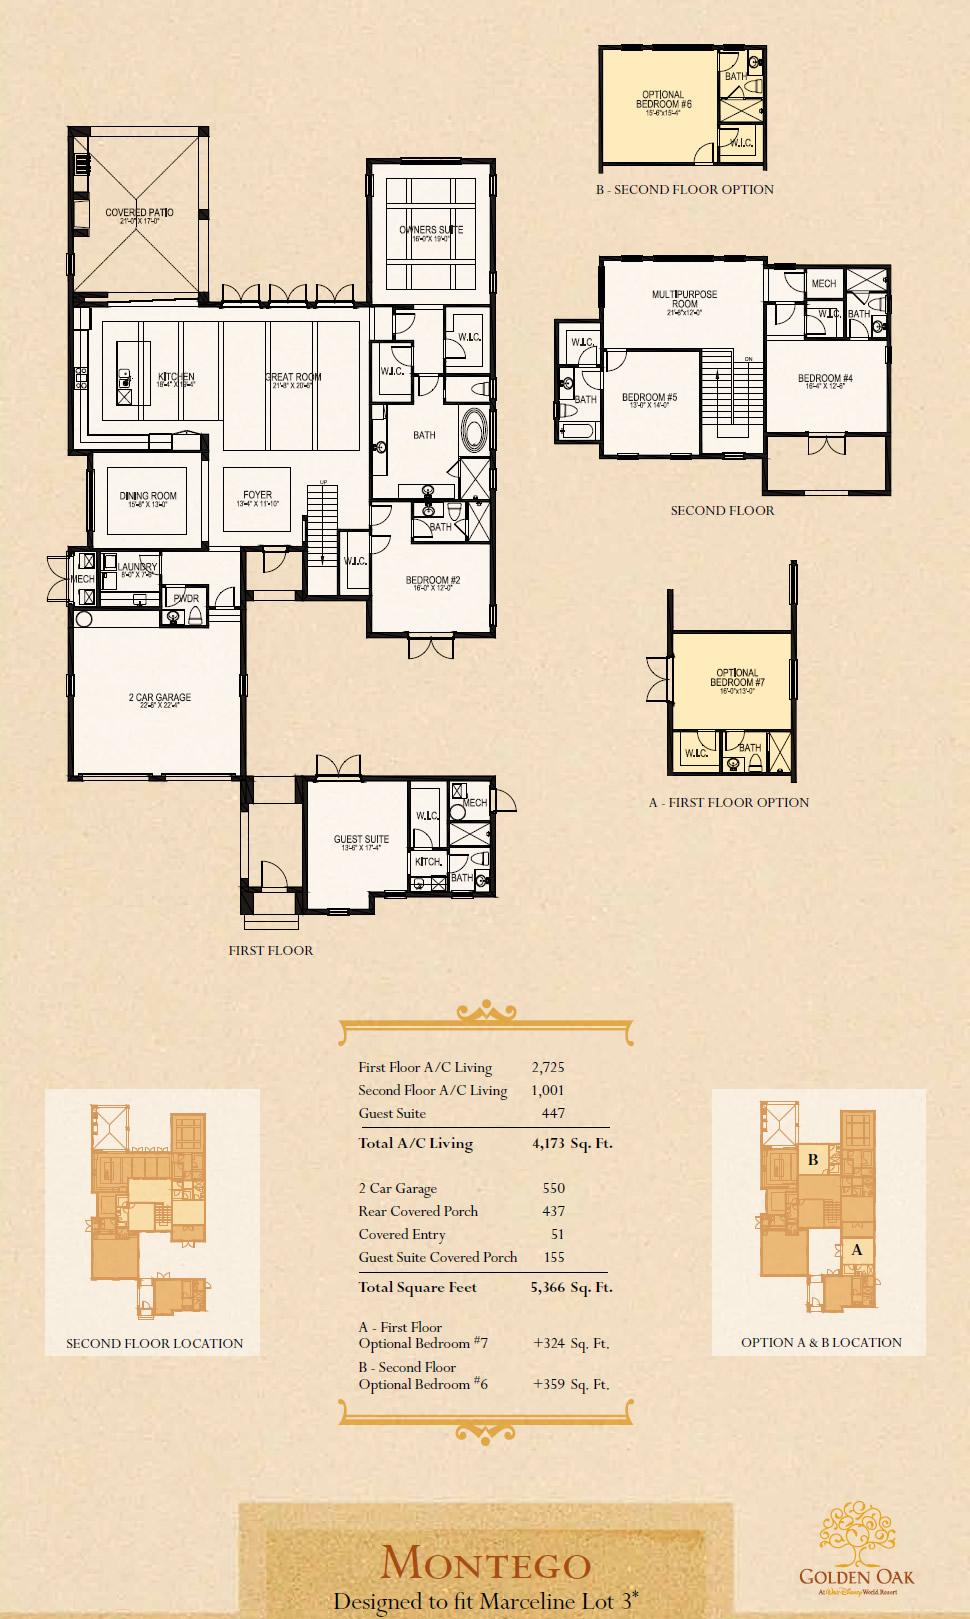 Disney golden oak luxury new homes in lake buena vistanew for Gt issa floor plans